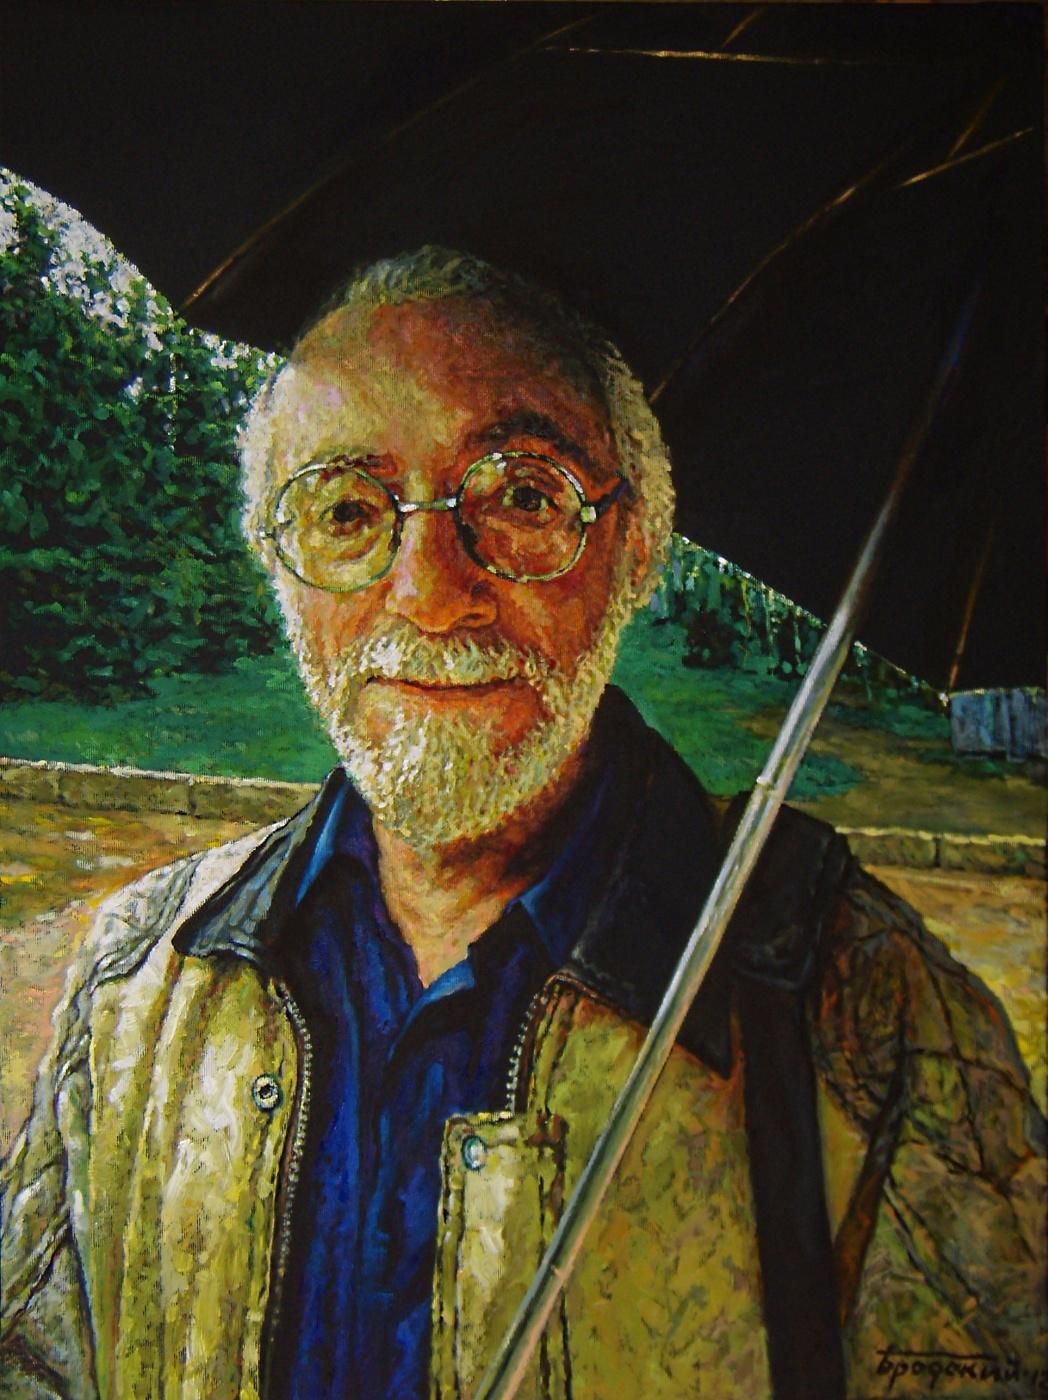 David Shikovich Brodsky. After the rain